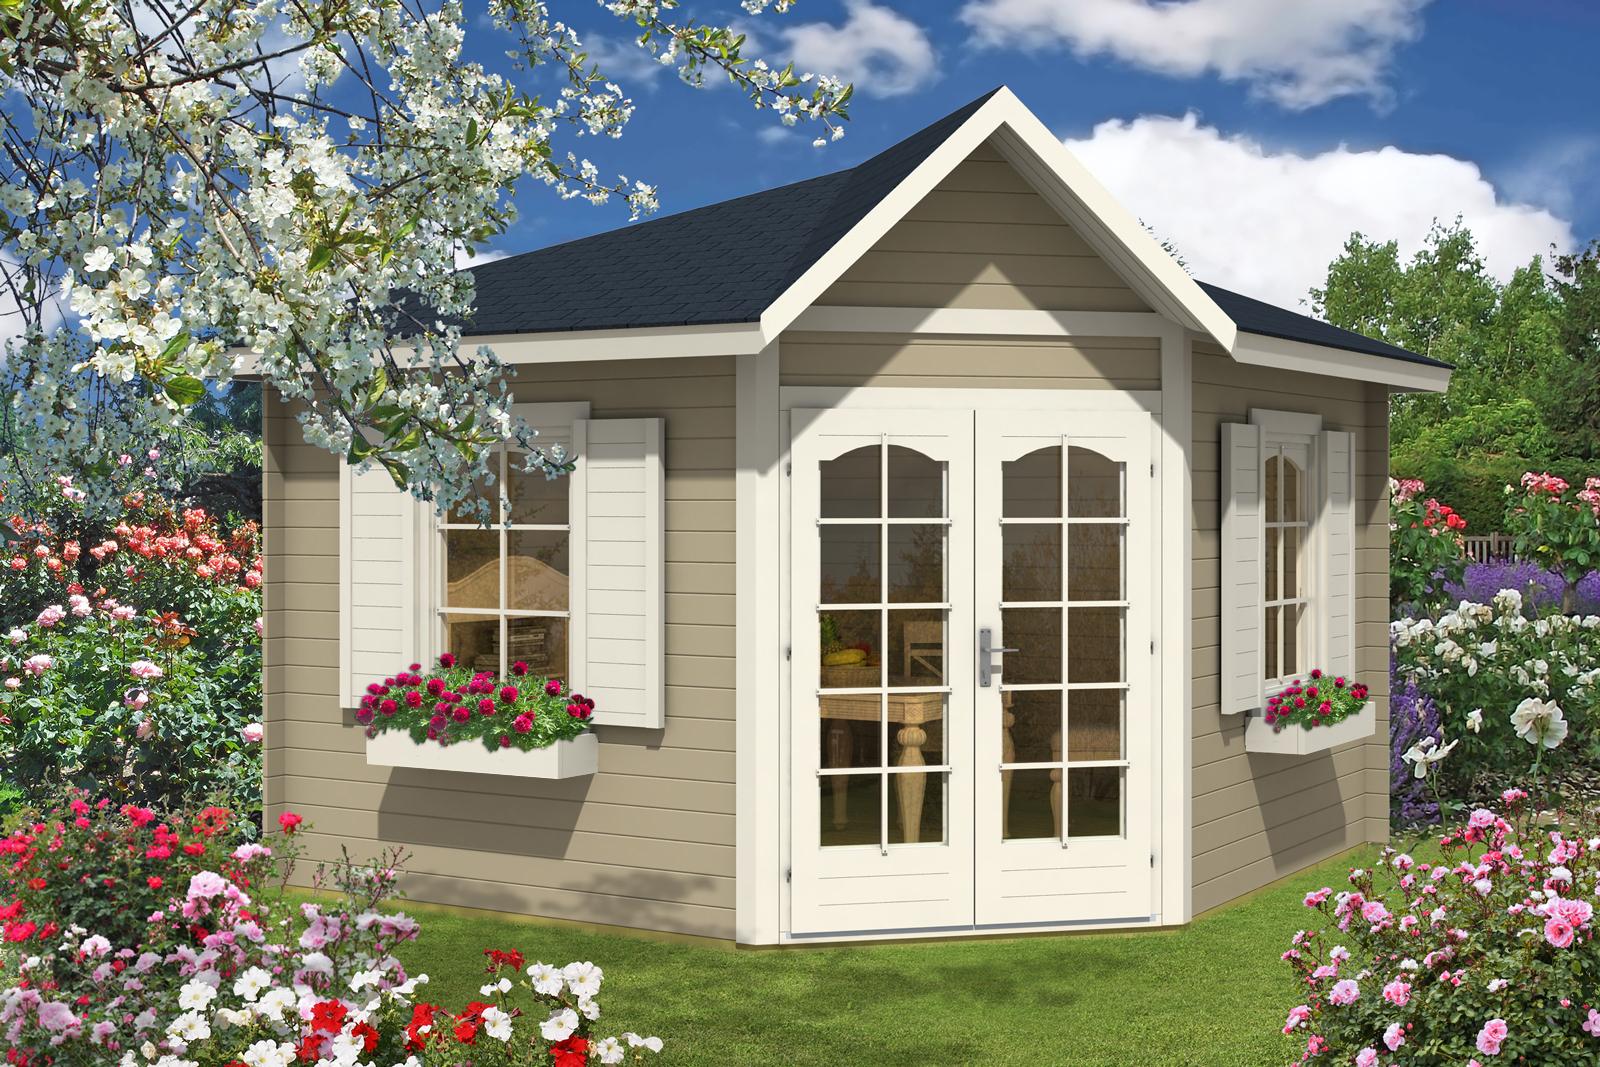 5 eck gartenhaus modell ancona 40. Black Bedroom Furniture Sets. Home Design Ideas